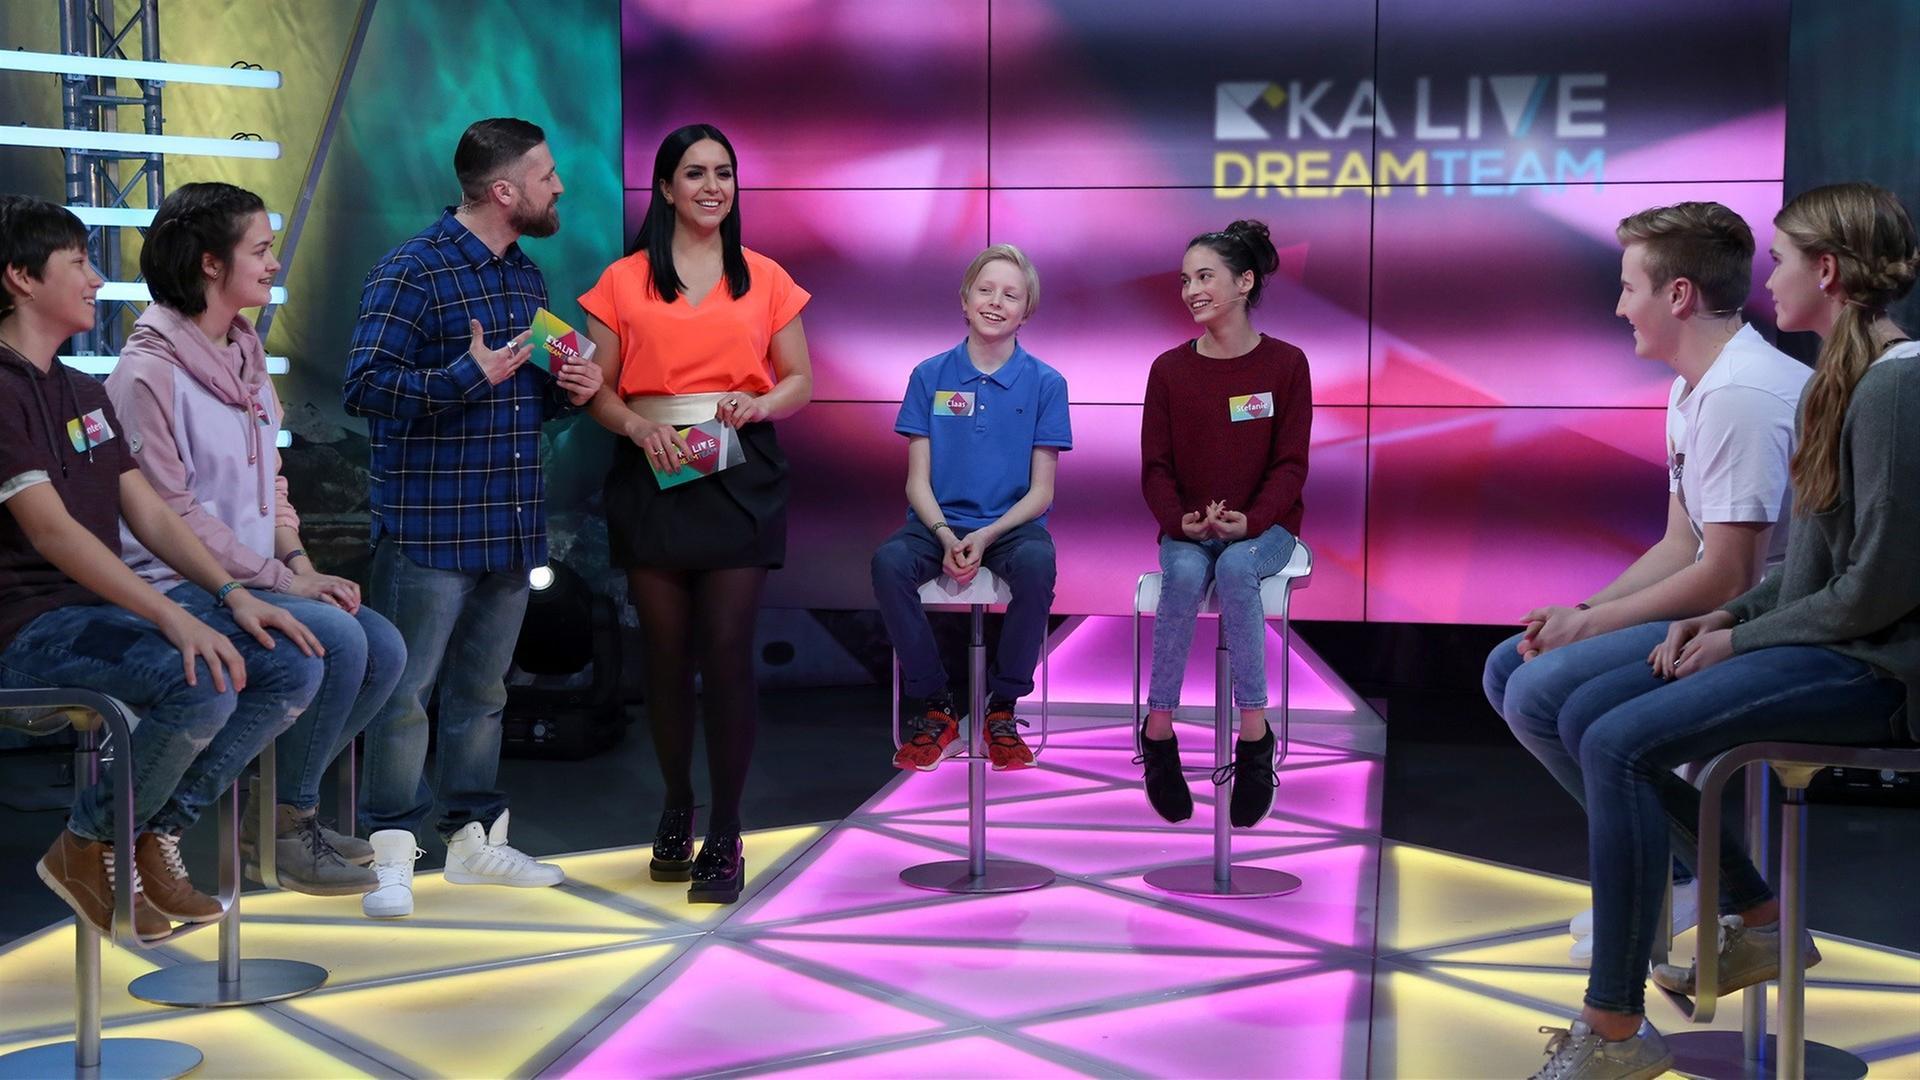 kika live dreamteam